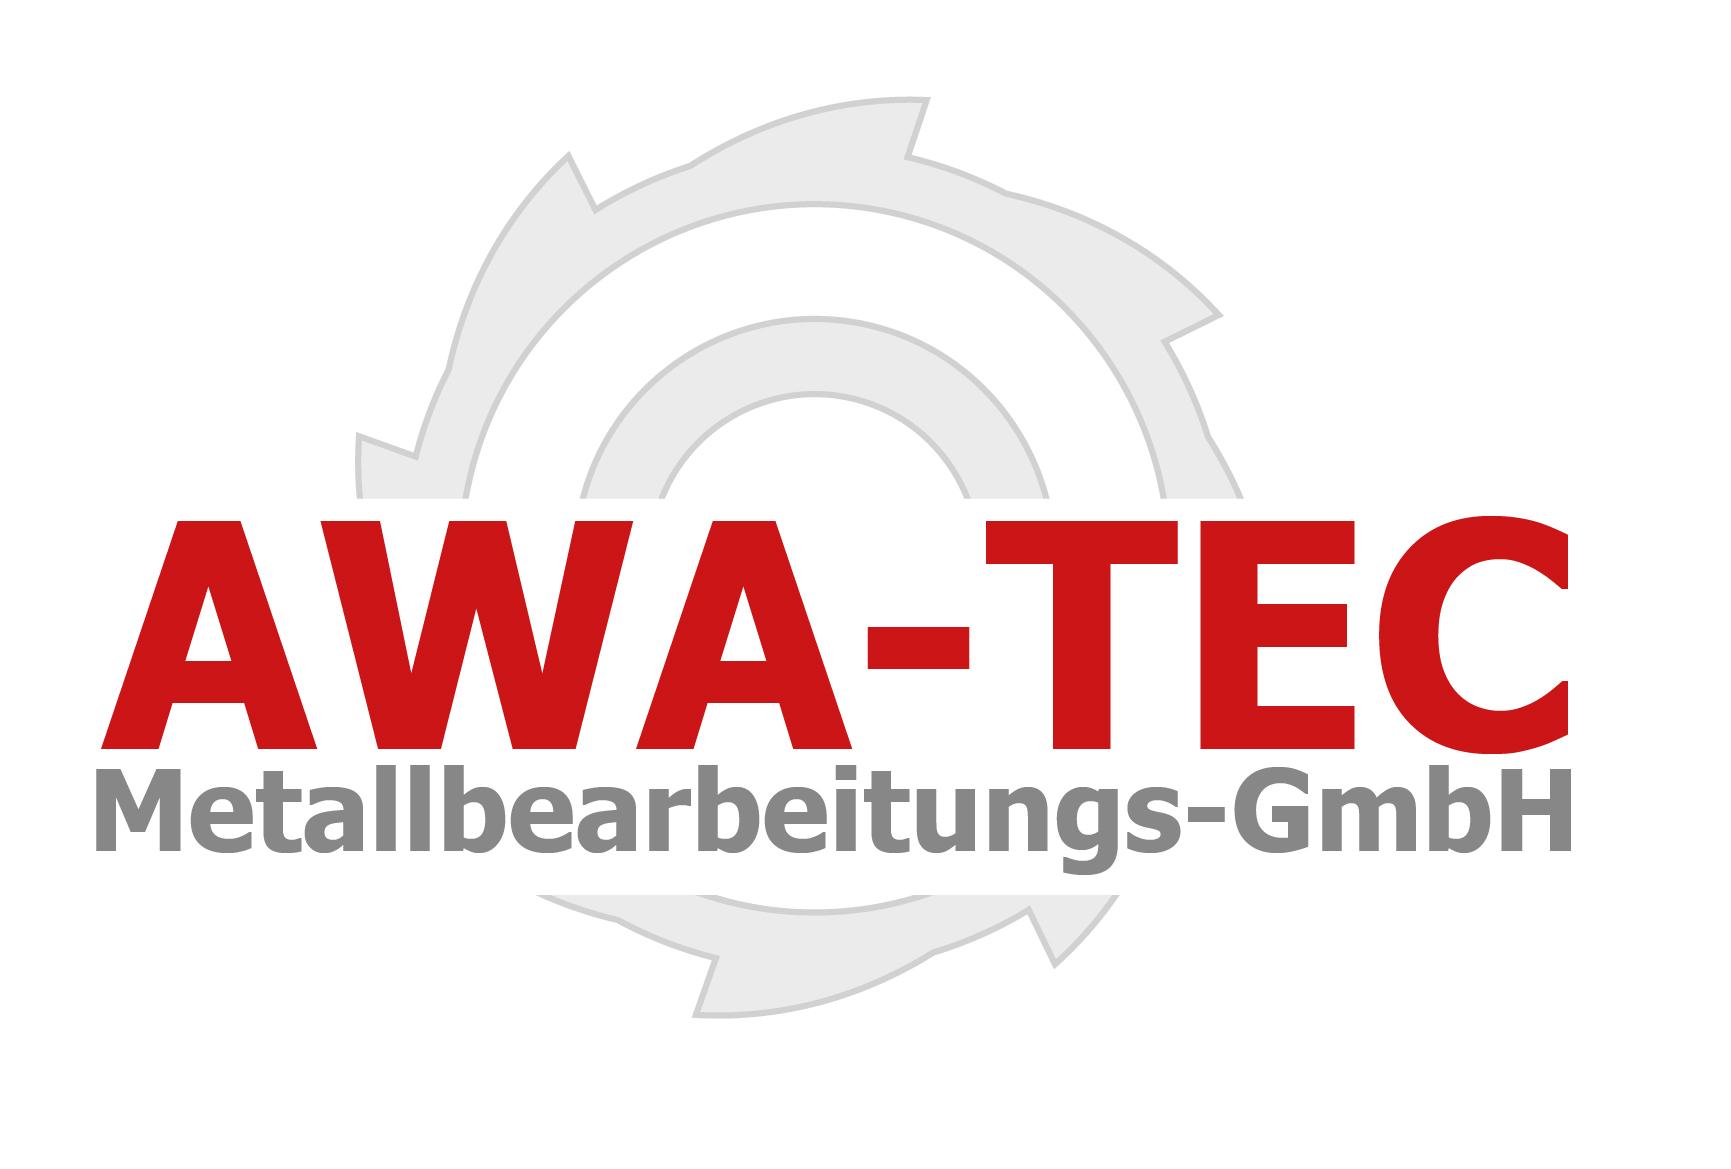 Awa-Tec Metallbearbeitung